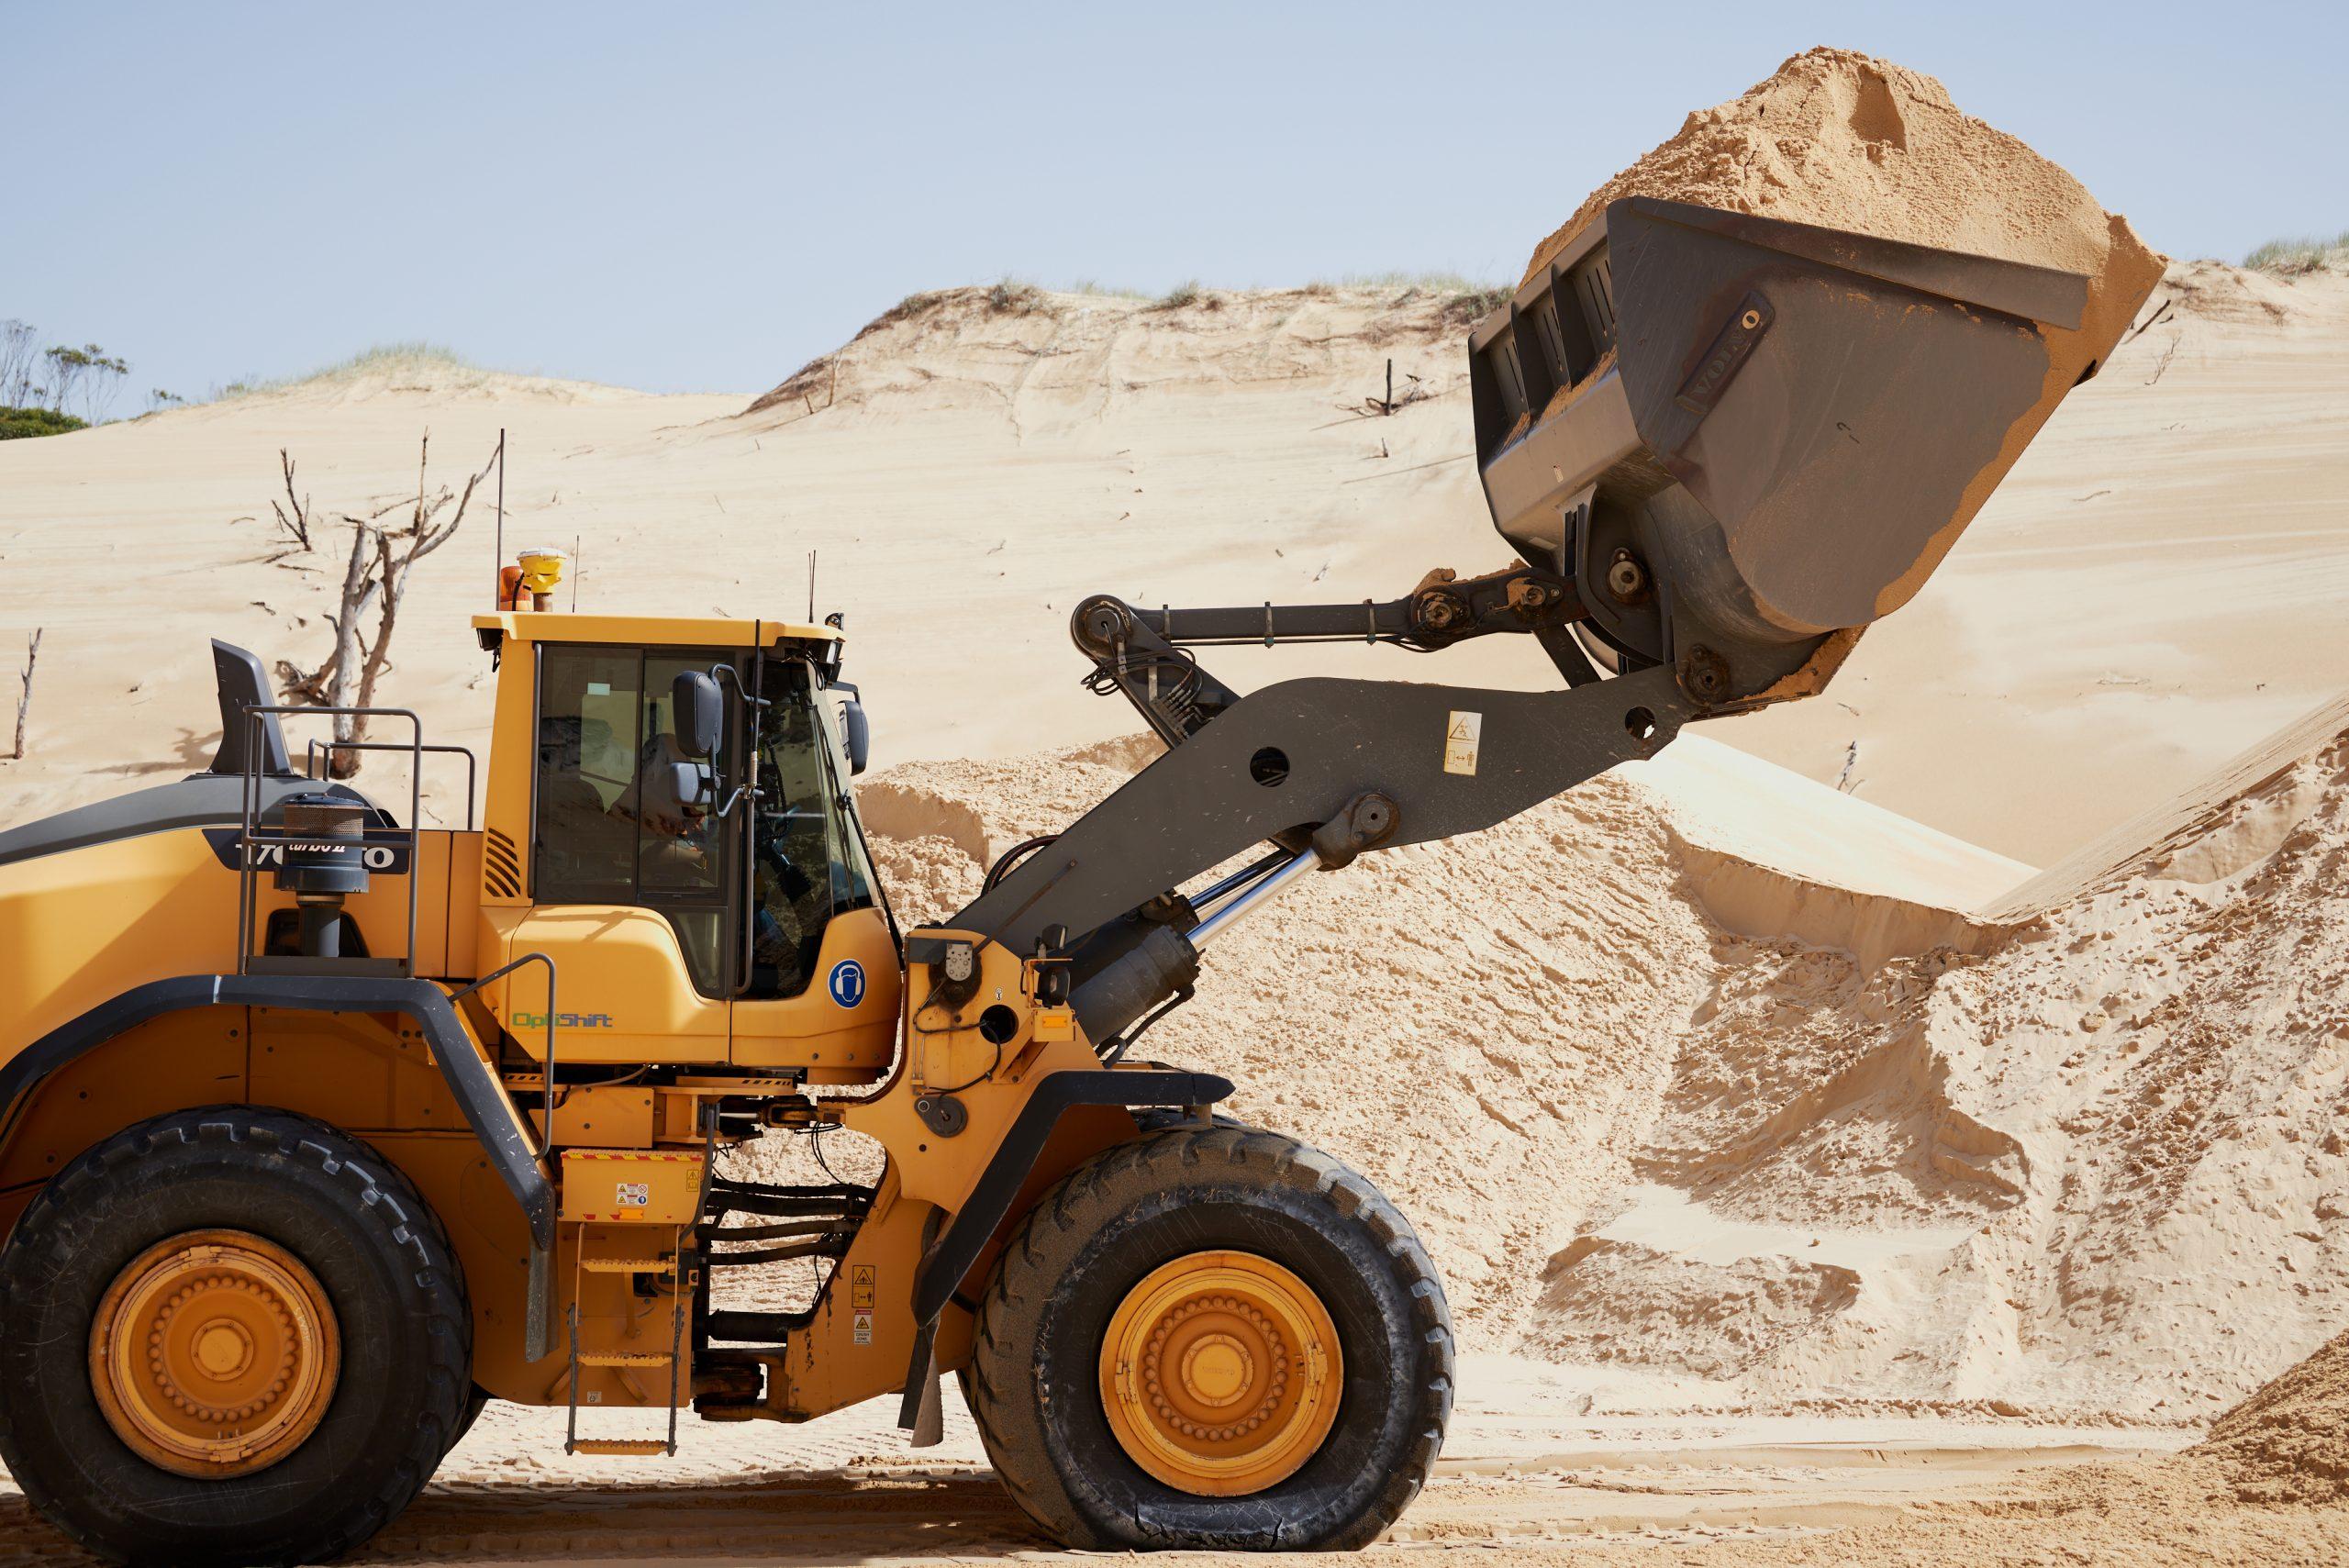 Macka's Sand & Soil Supplies and CJD Equipment 6